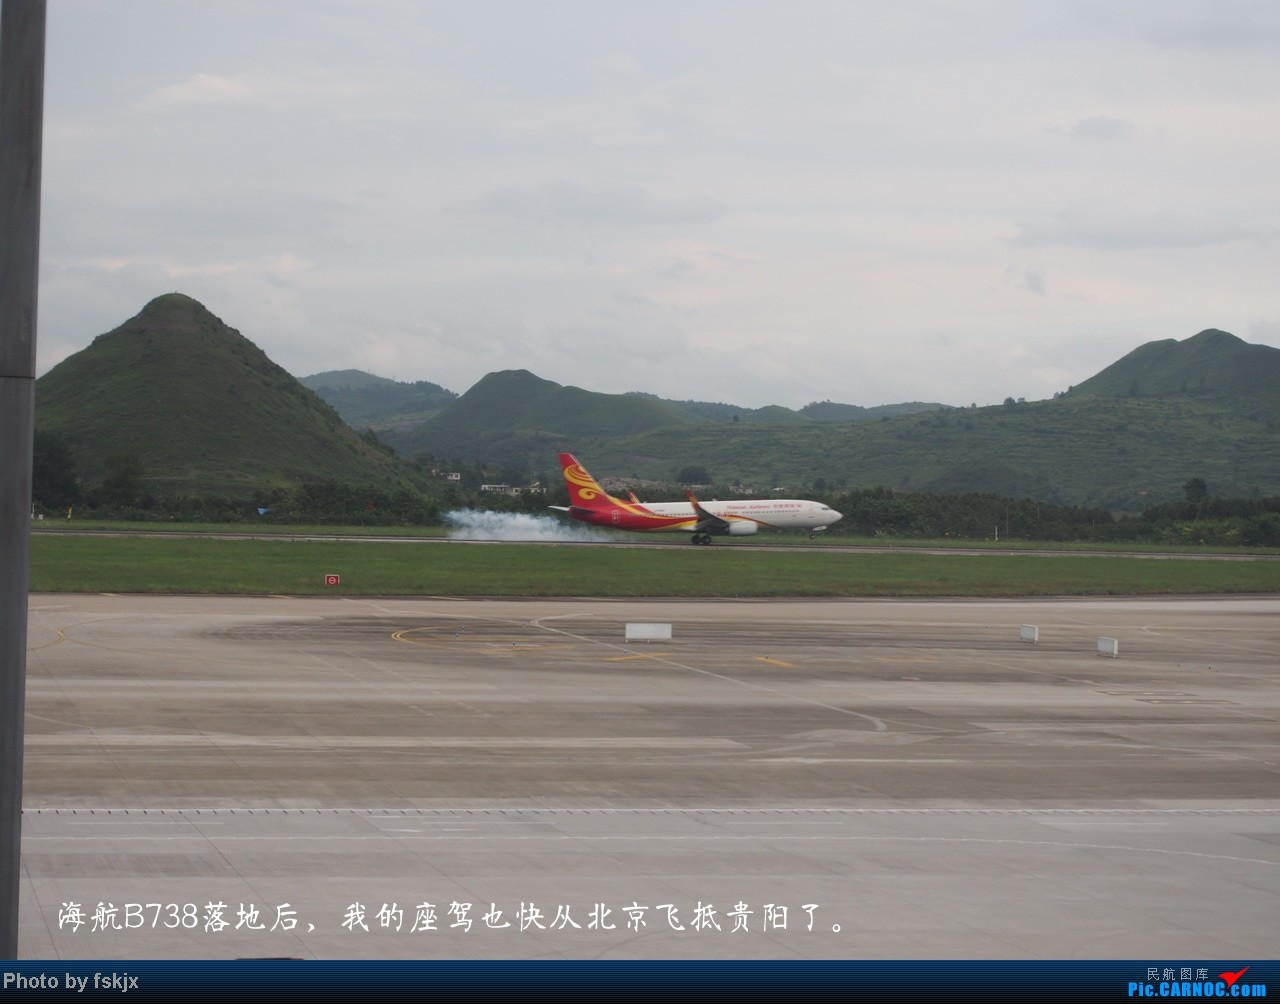 【fskjx的飞行游记☆9】盛夏贵州避暑,感受壮观的黄果树瀑布 BOEING 737-800  中国贵阳龙洞堡机场